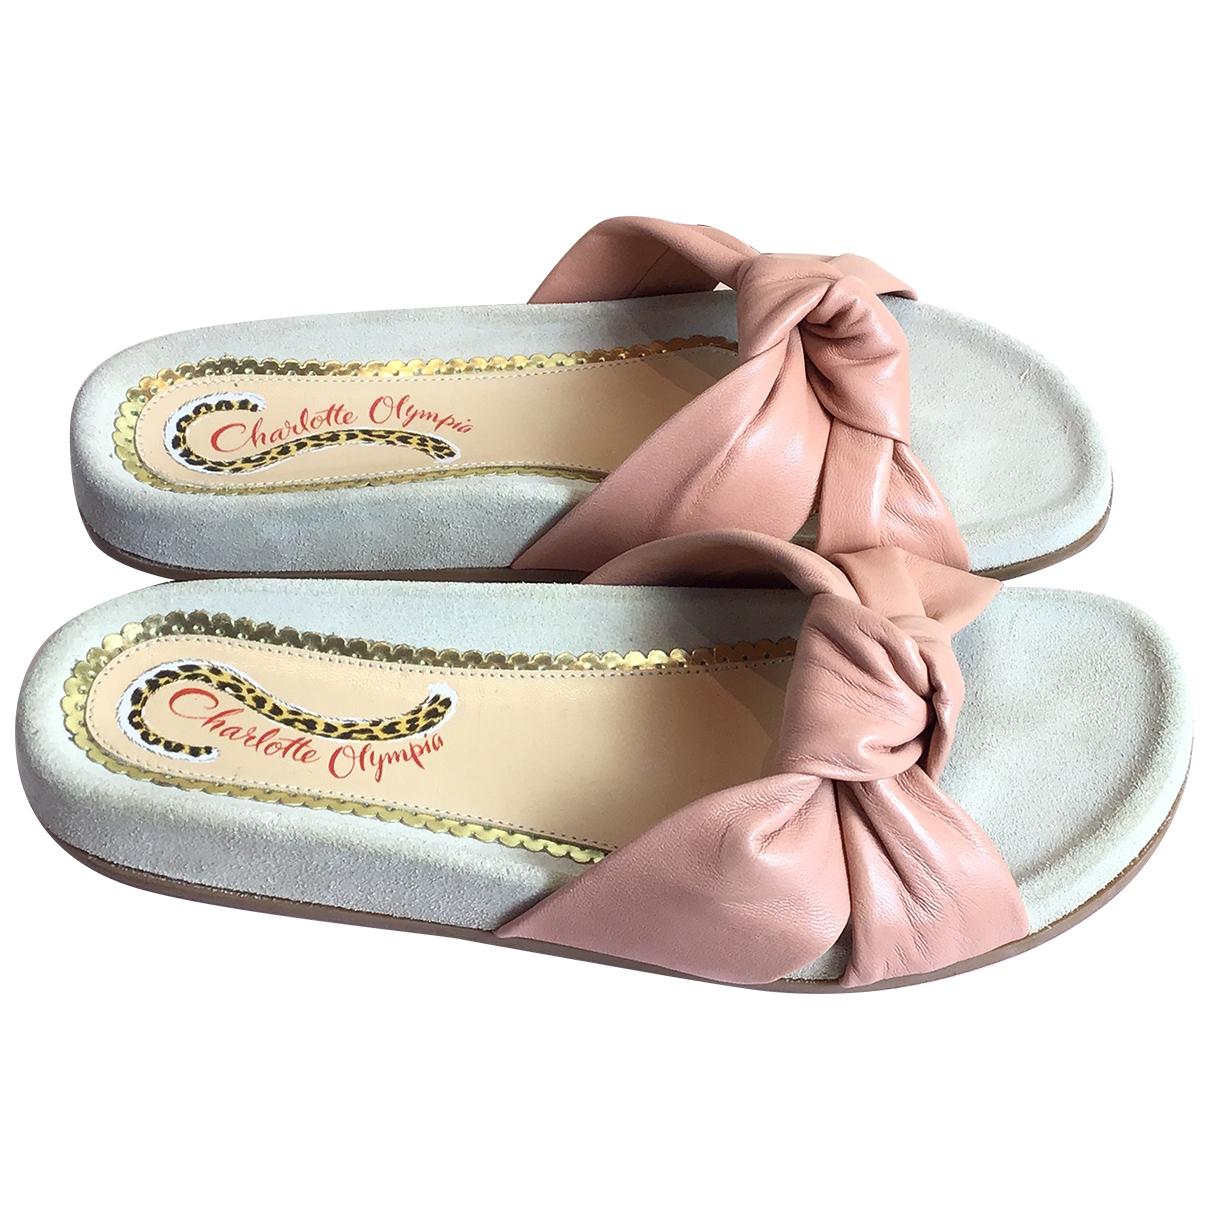 Charlotte Olympia - Sandales   pour femme en cuir - rose